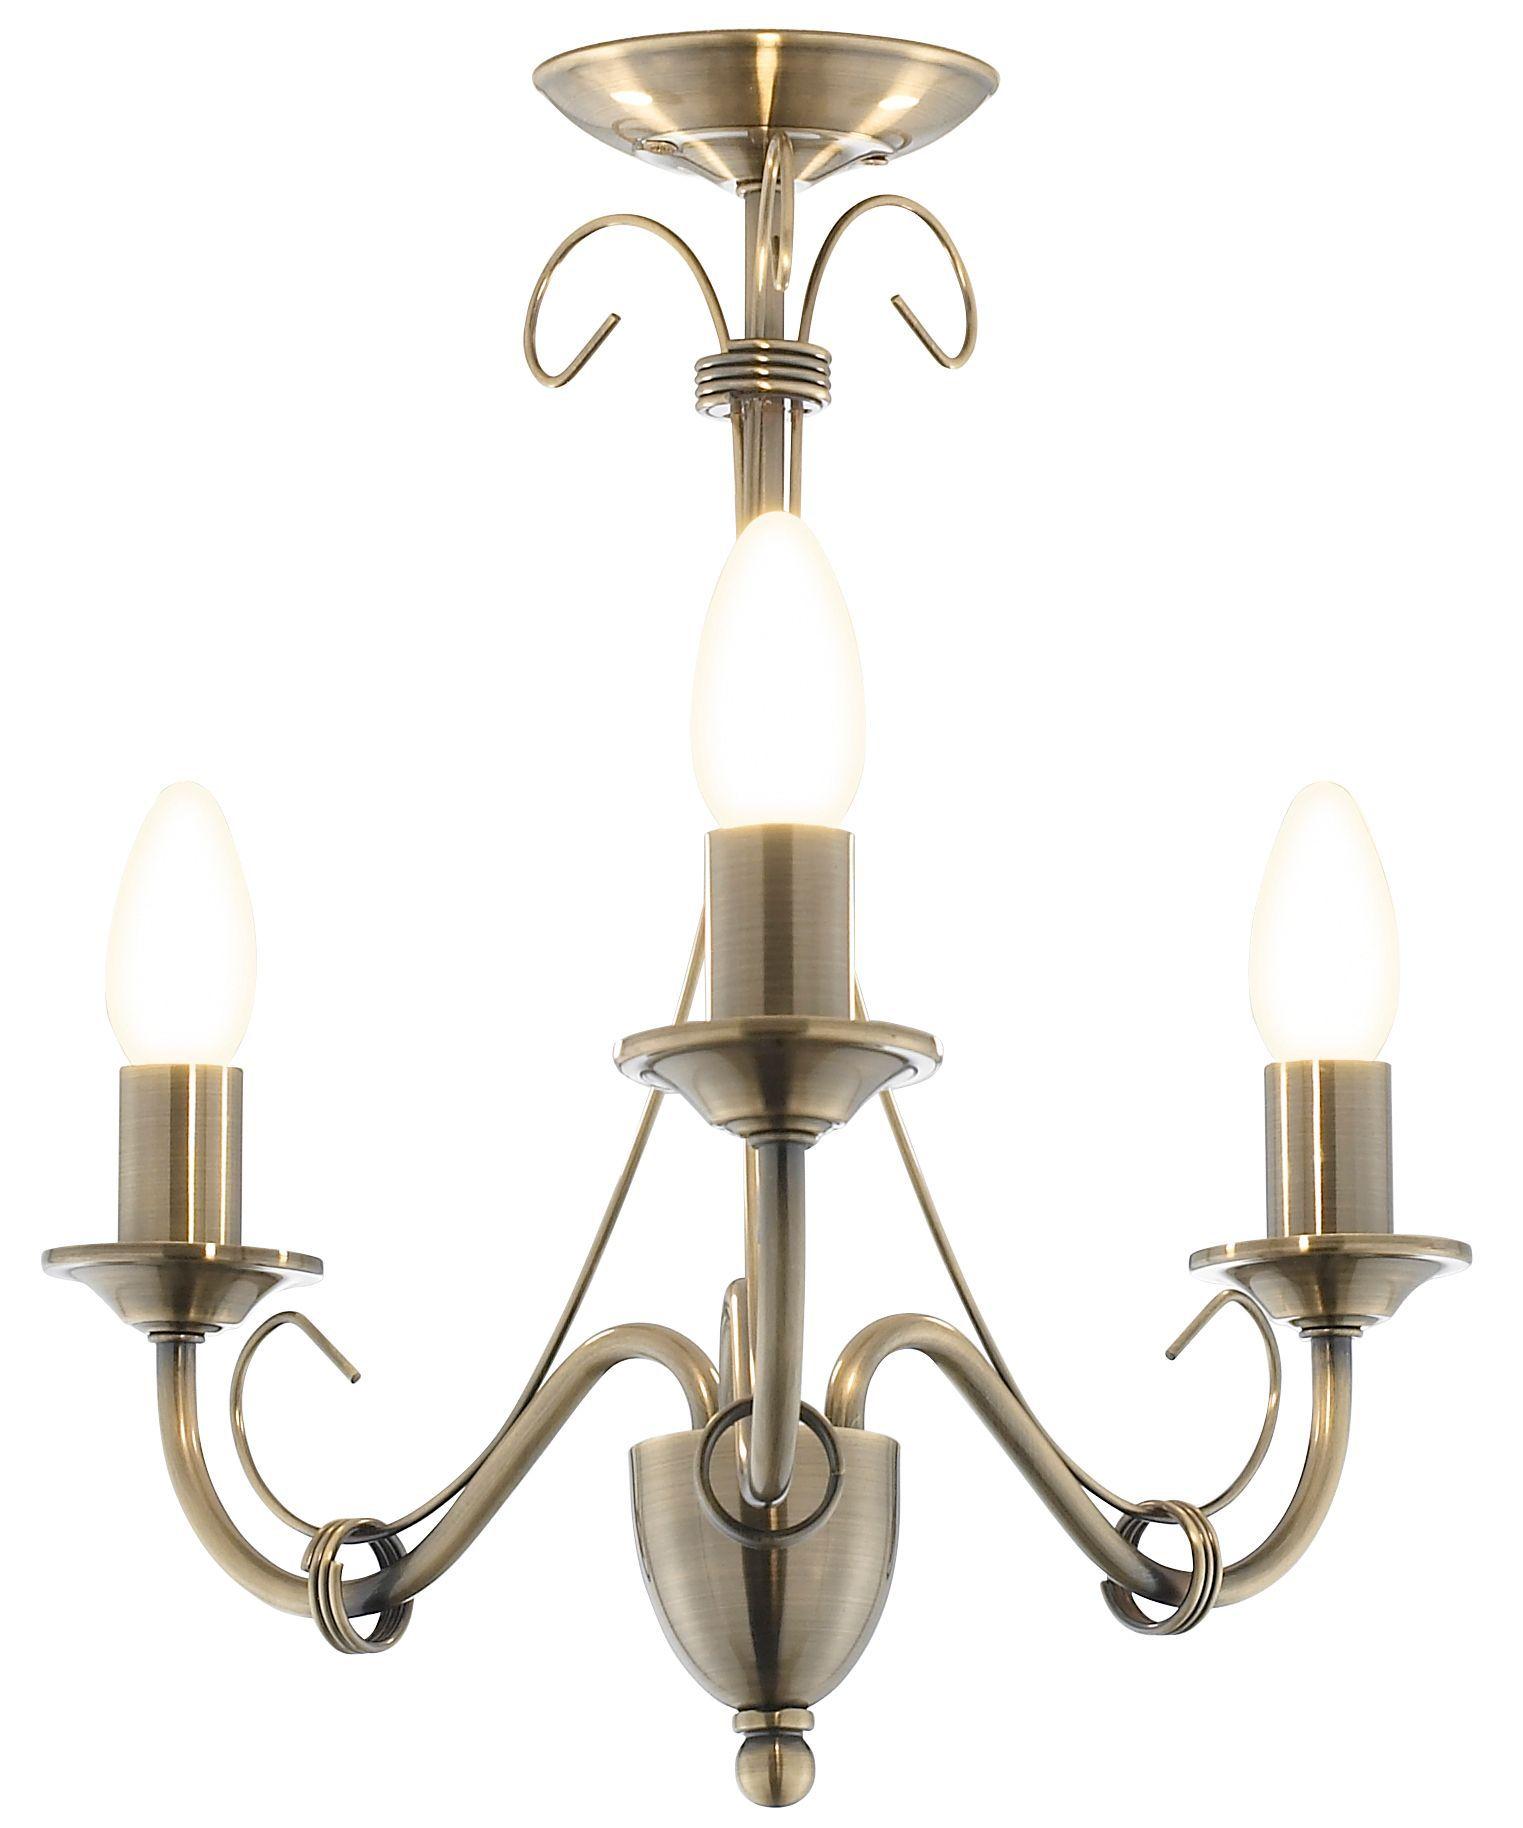 Priory Gold 3 Lamp Ceiling Light | Departments | DIY at B&Q